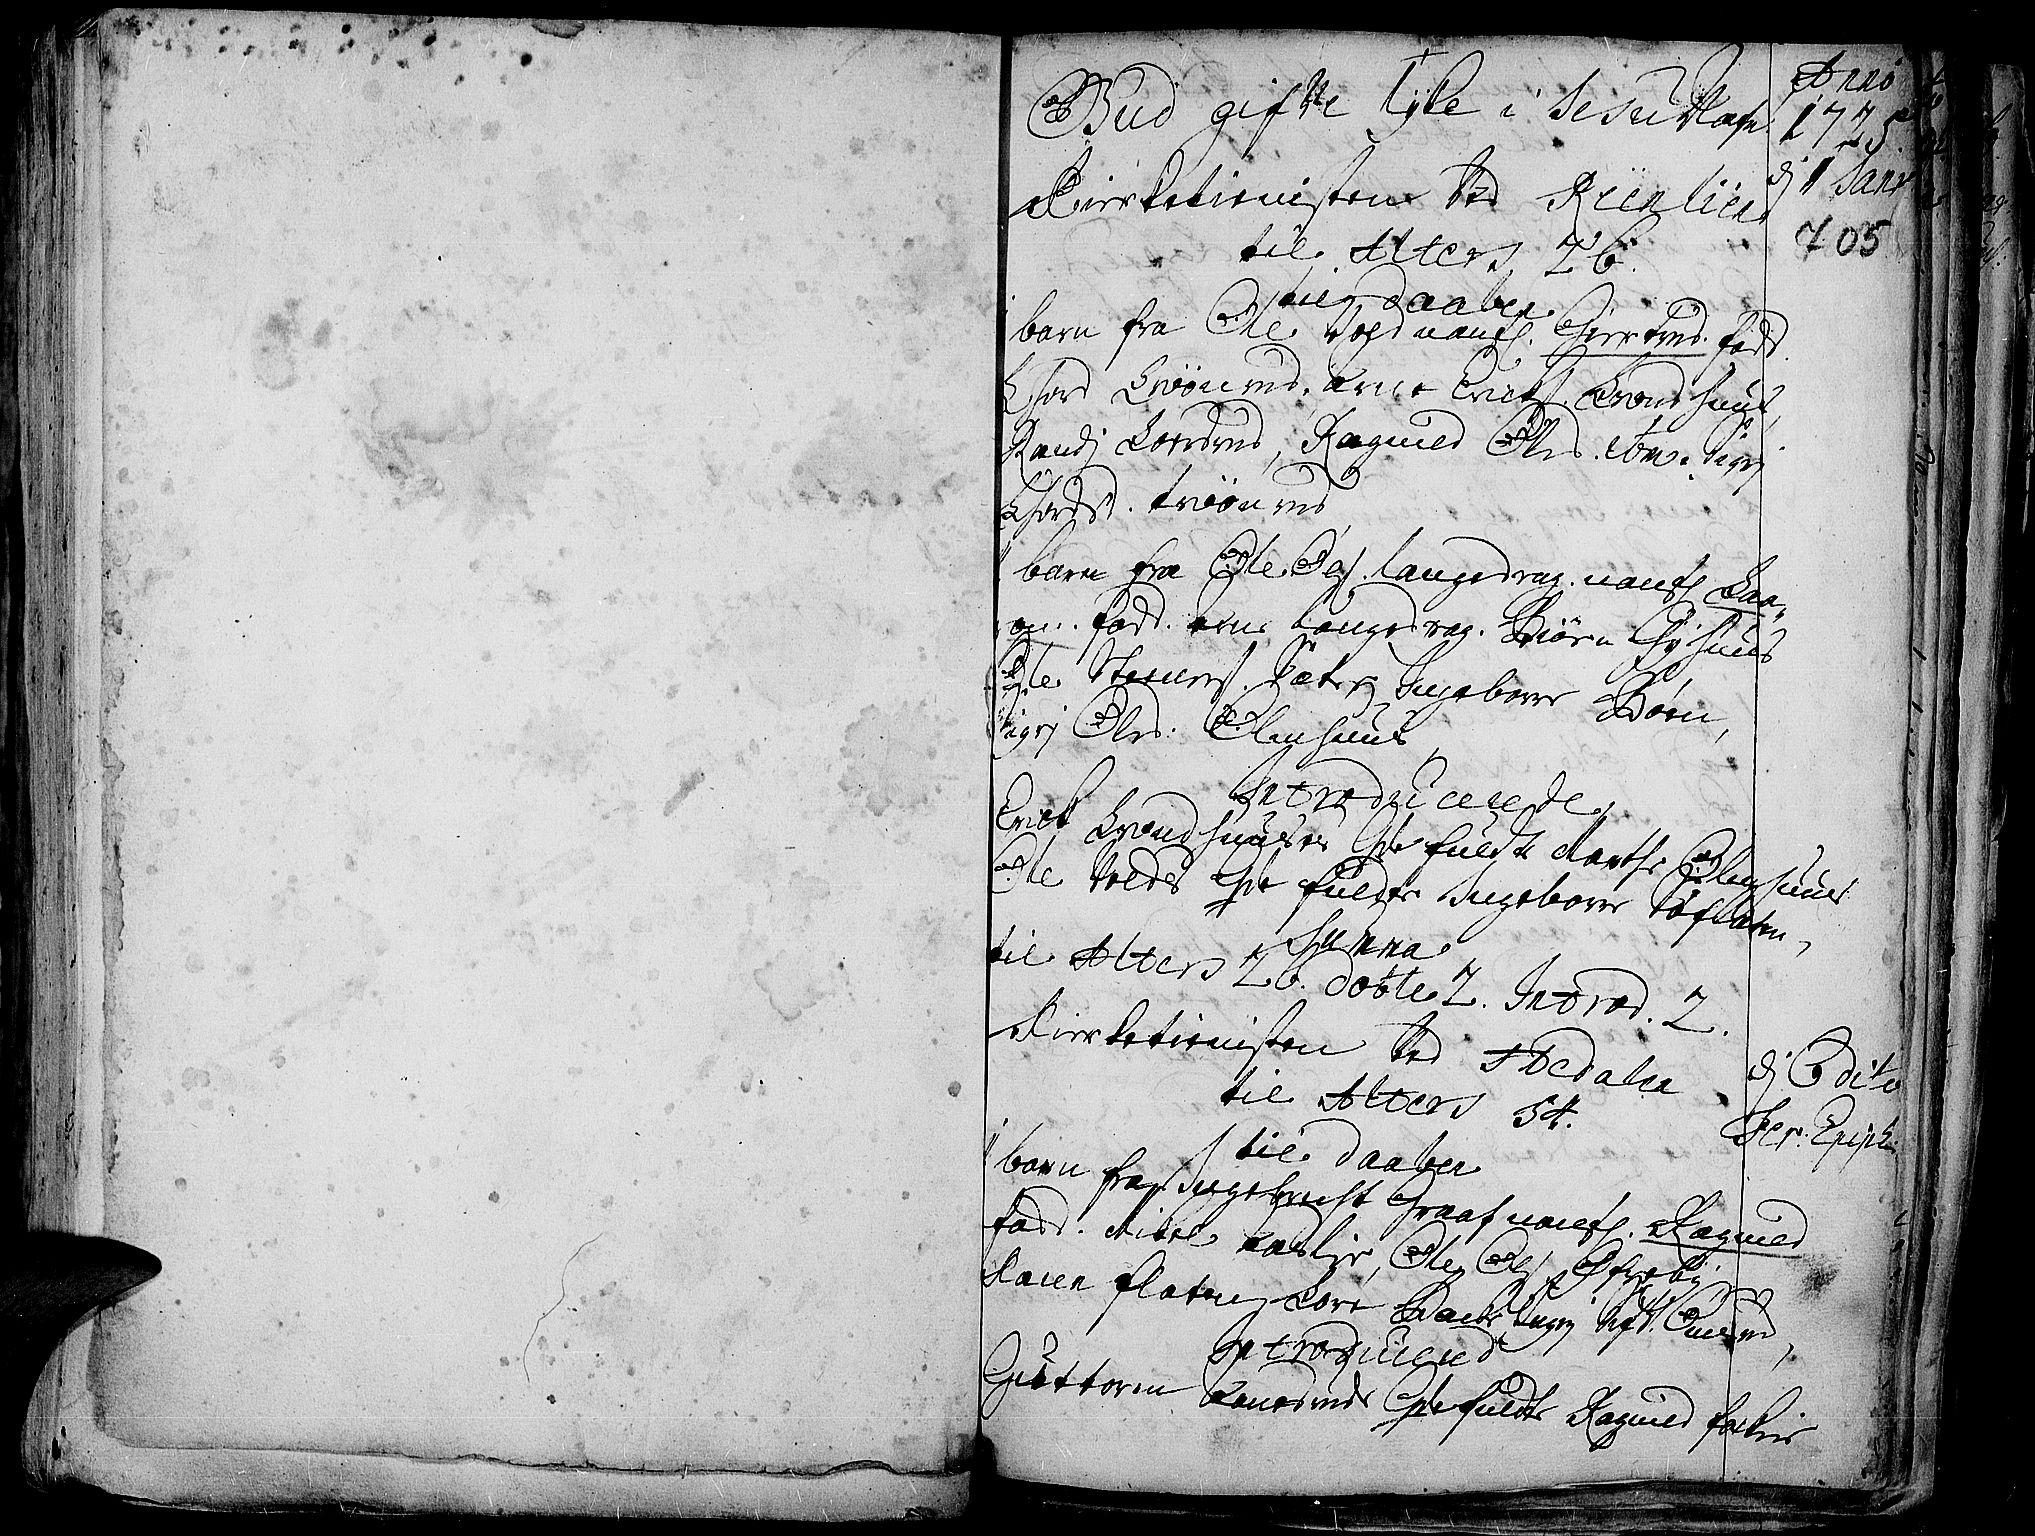 SAH, Aurdal prestekontor, Ministerialbok nr. 1-3, 1692-1730, s. 705